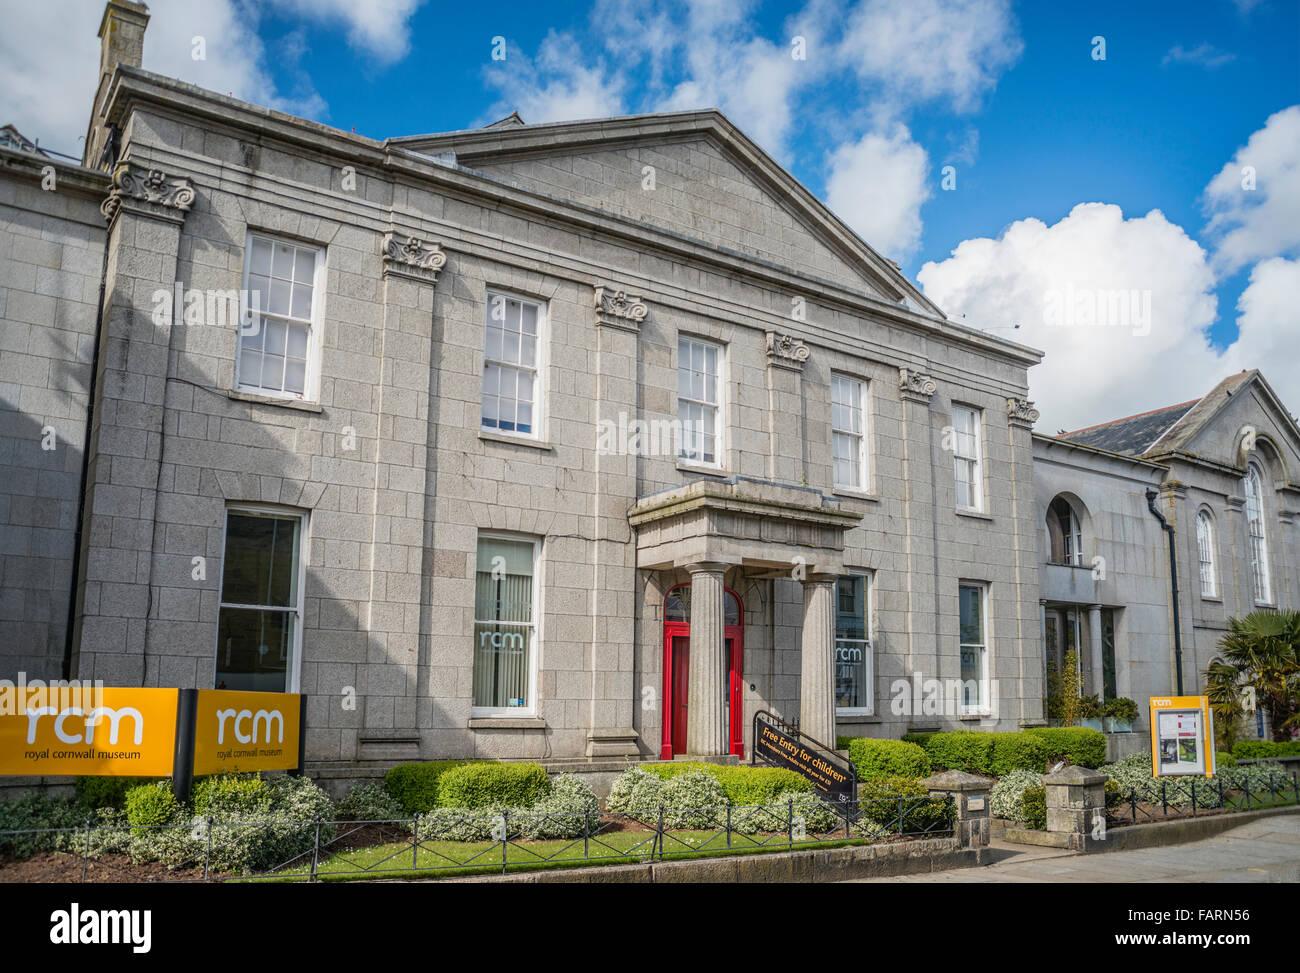 Royal Cornwall Museum, Truro, Cornwall, England, UK - Stock Image